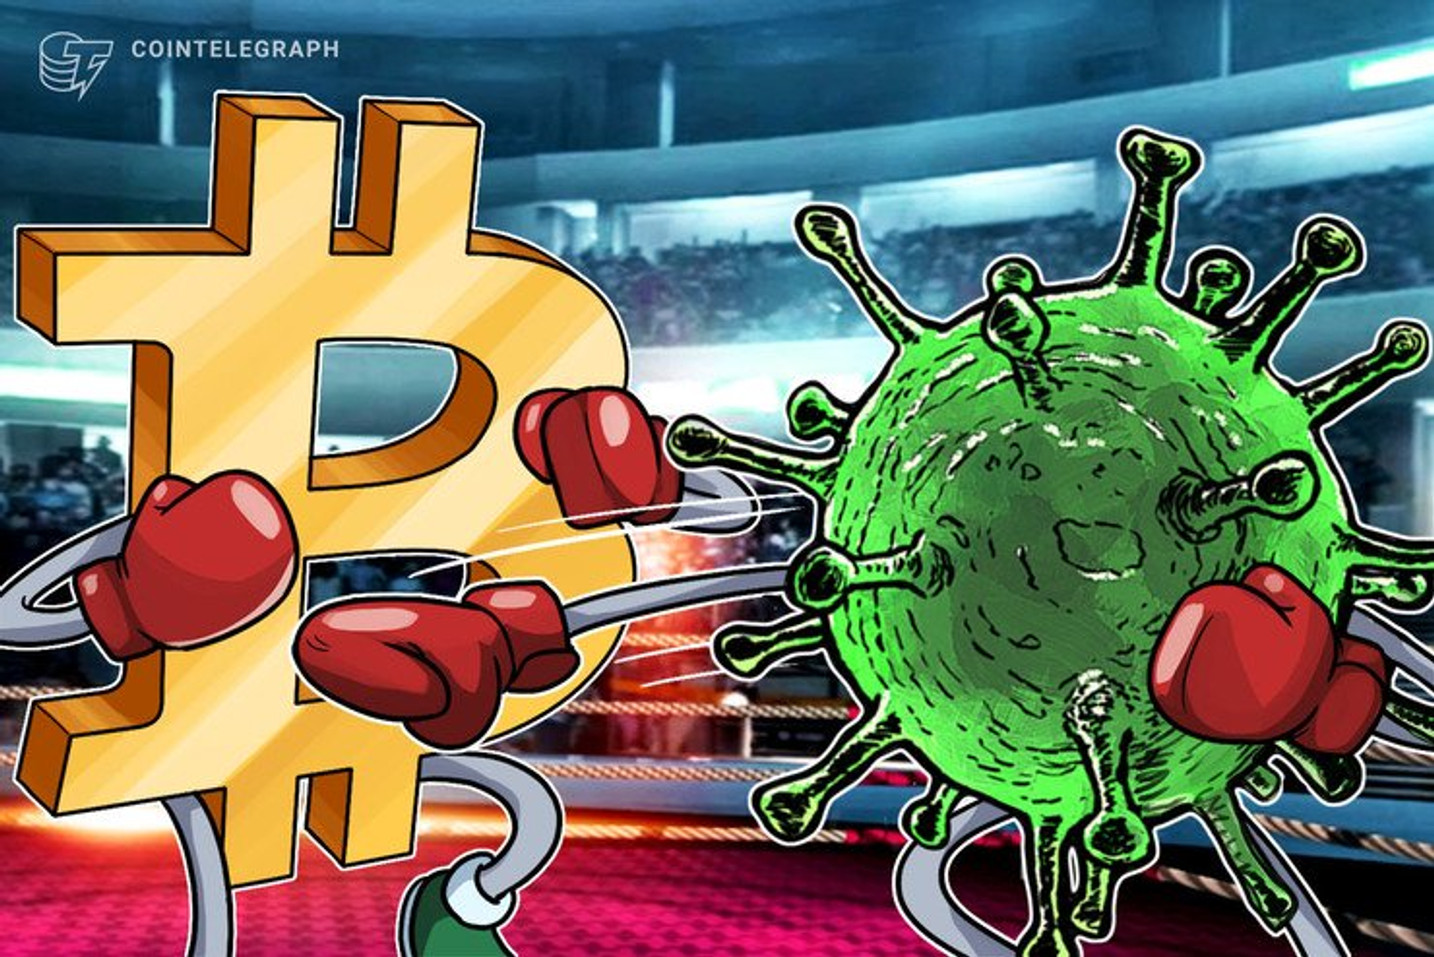 Especialistas atribuem chegada do Bitcoin aos US$ 10.000 ao surto de coronavírus